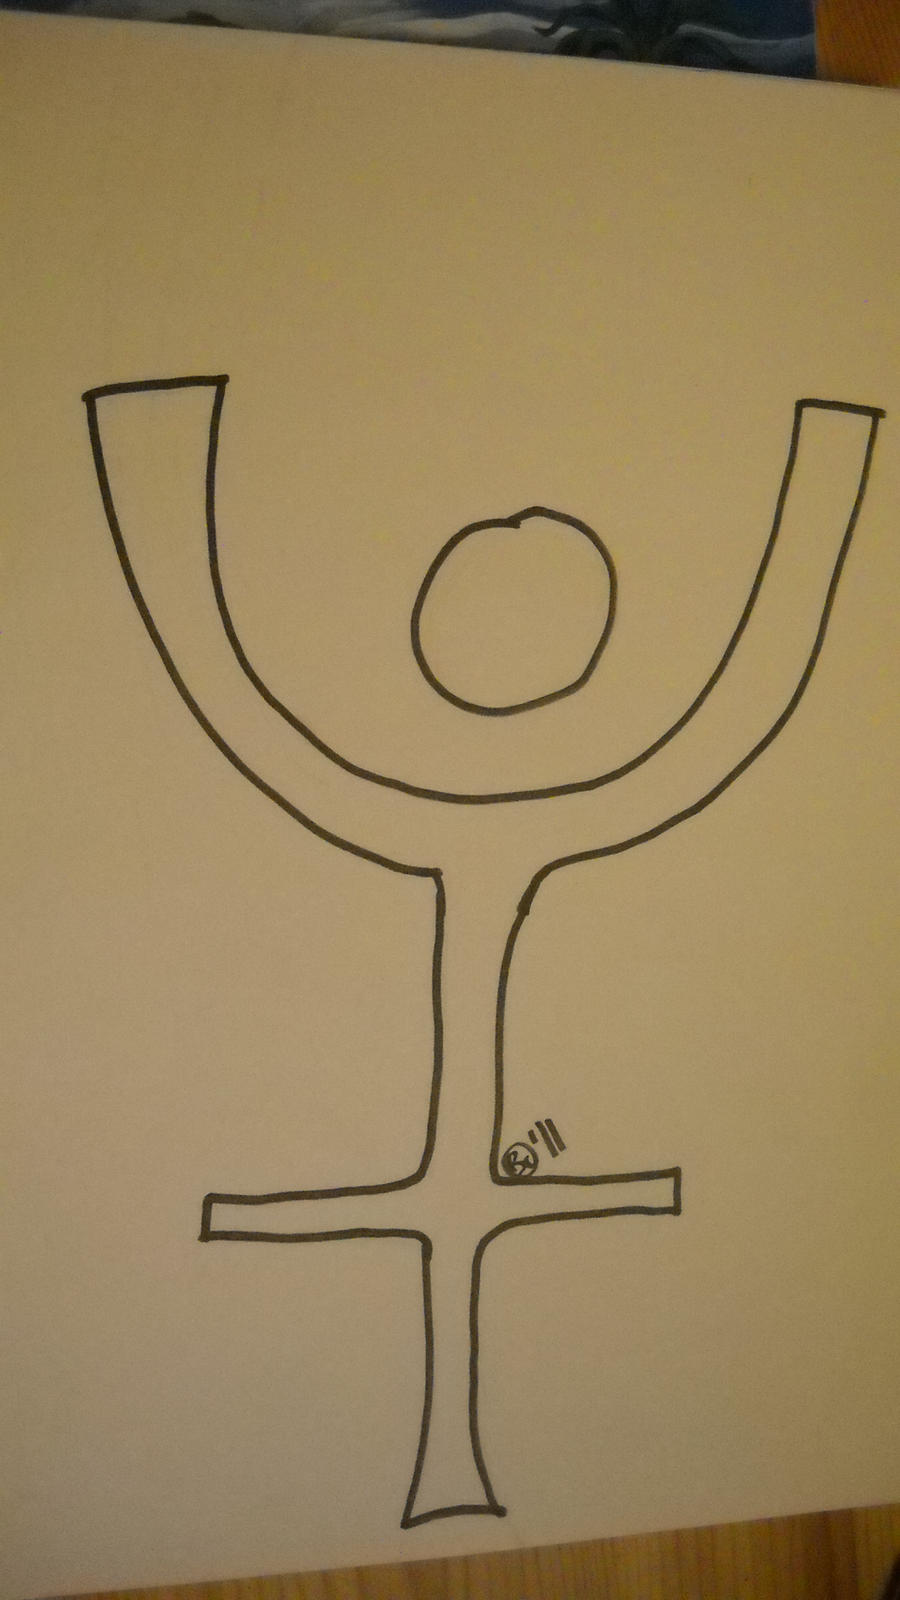 hades symbol coloring pages - photo#13